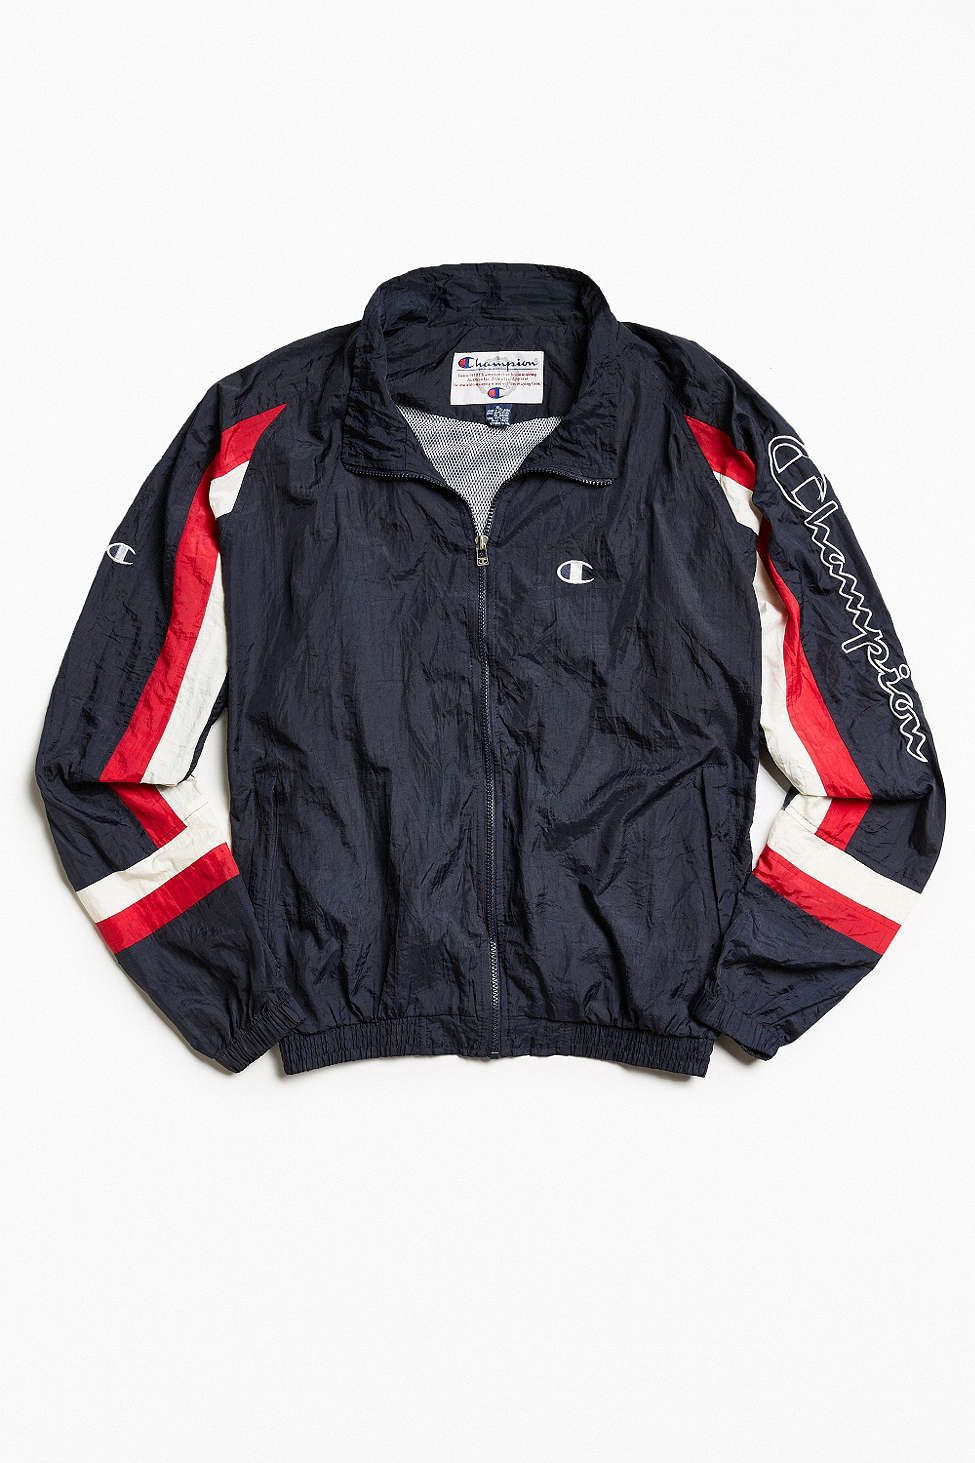 9d2f424d6ca3 Vintage Champion Windbreaker Jacket | retro sports jkt | Vintage ...